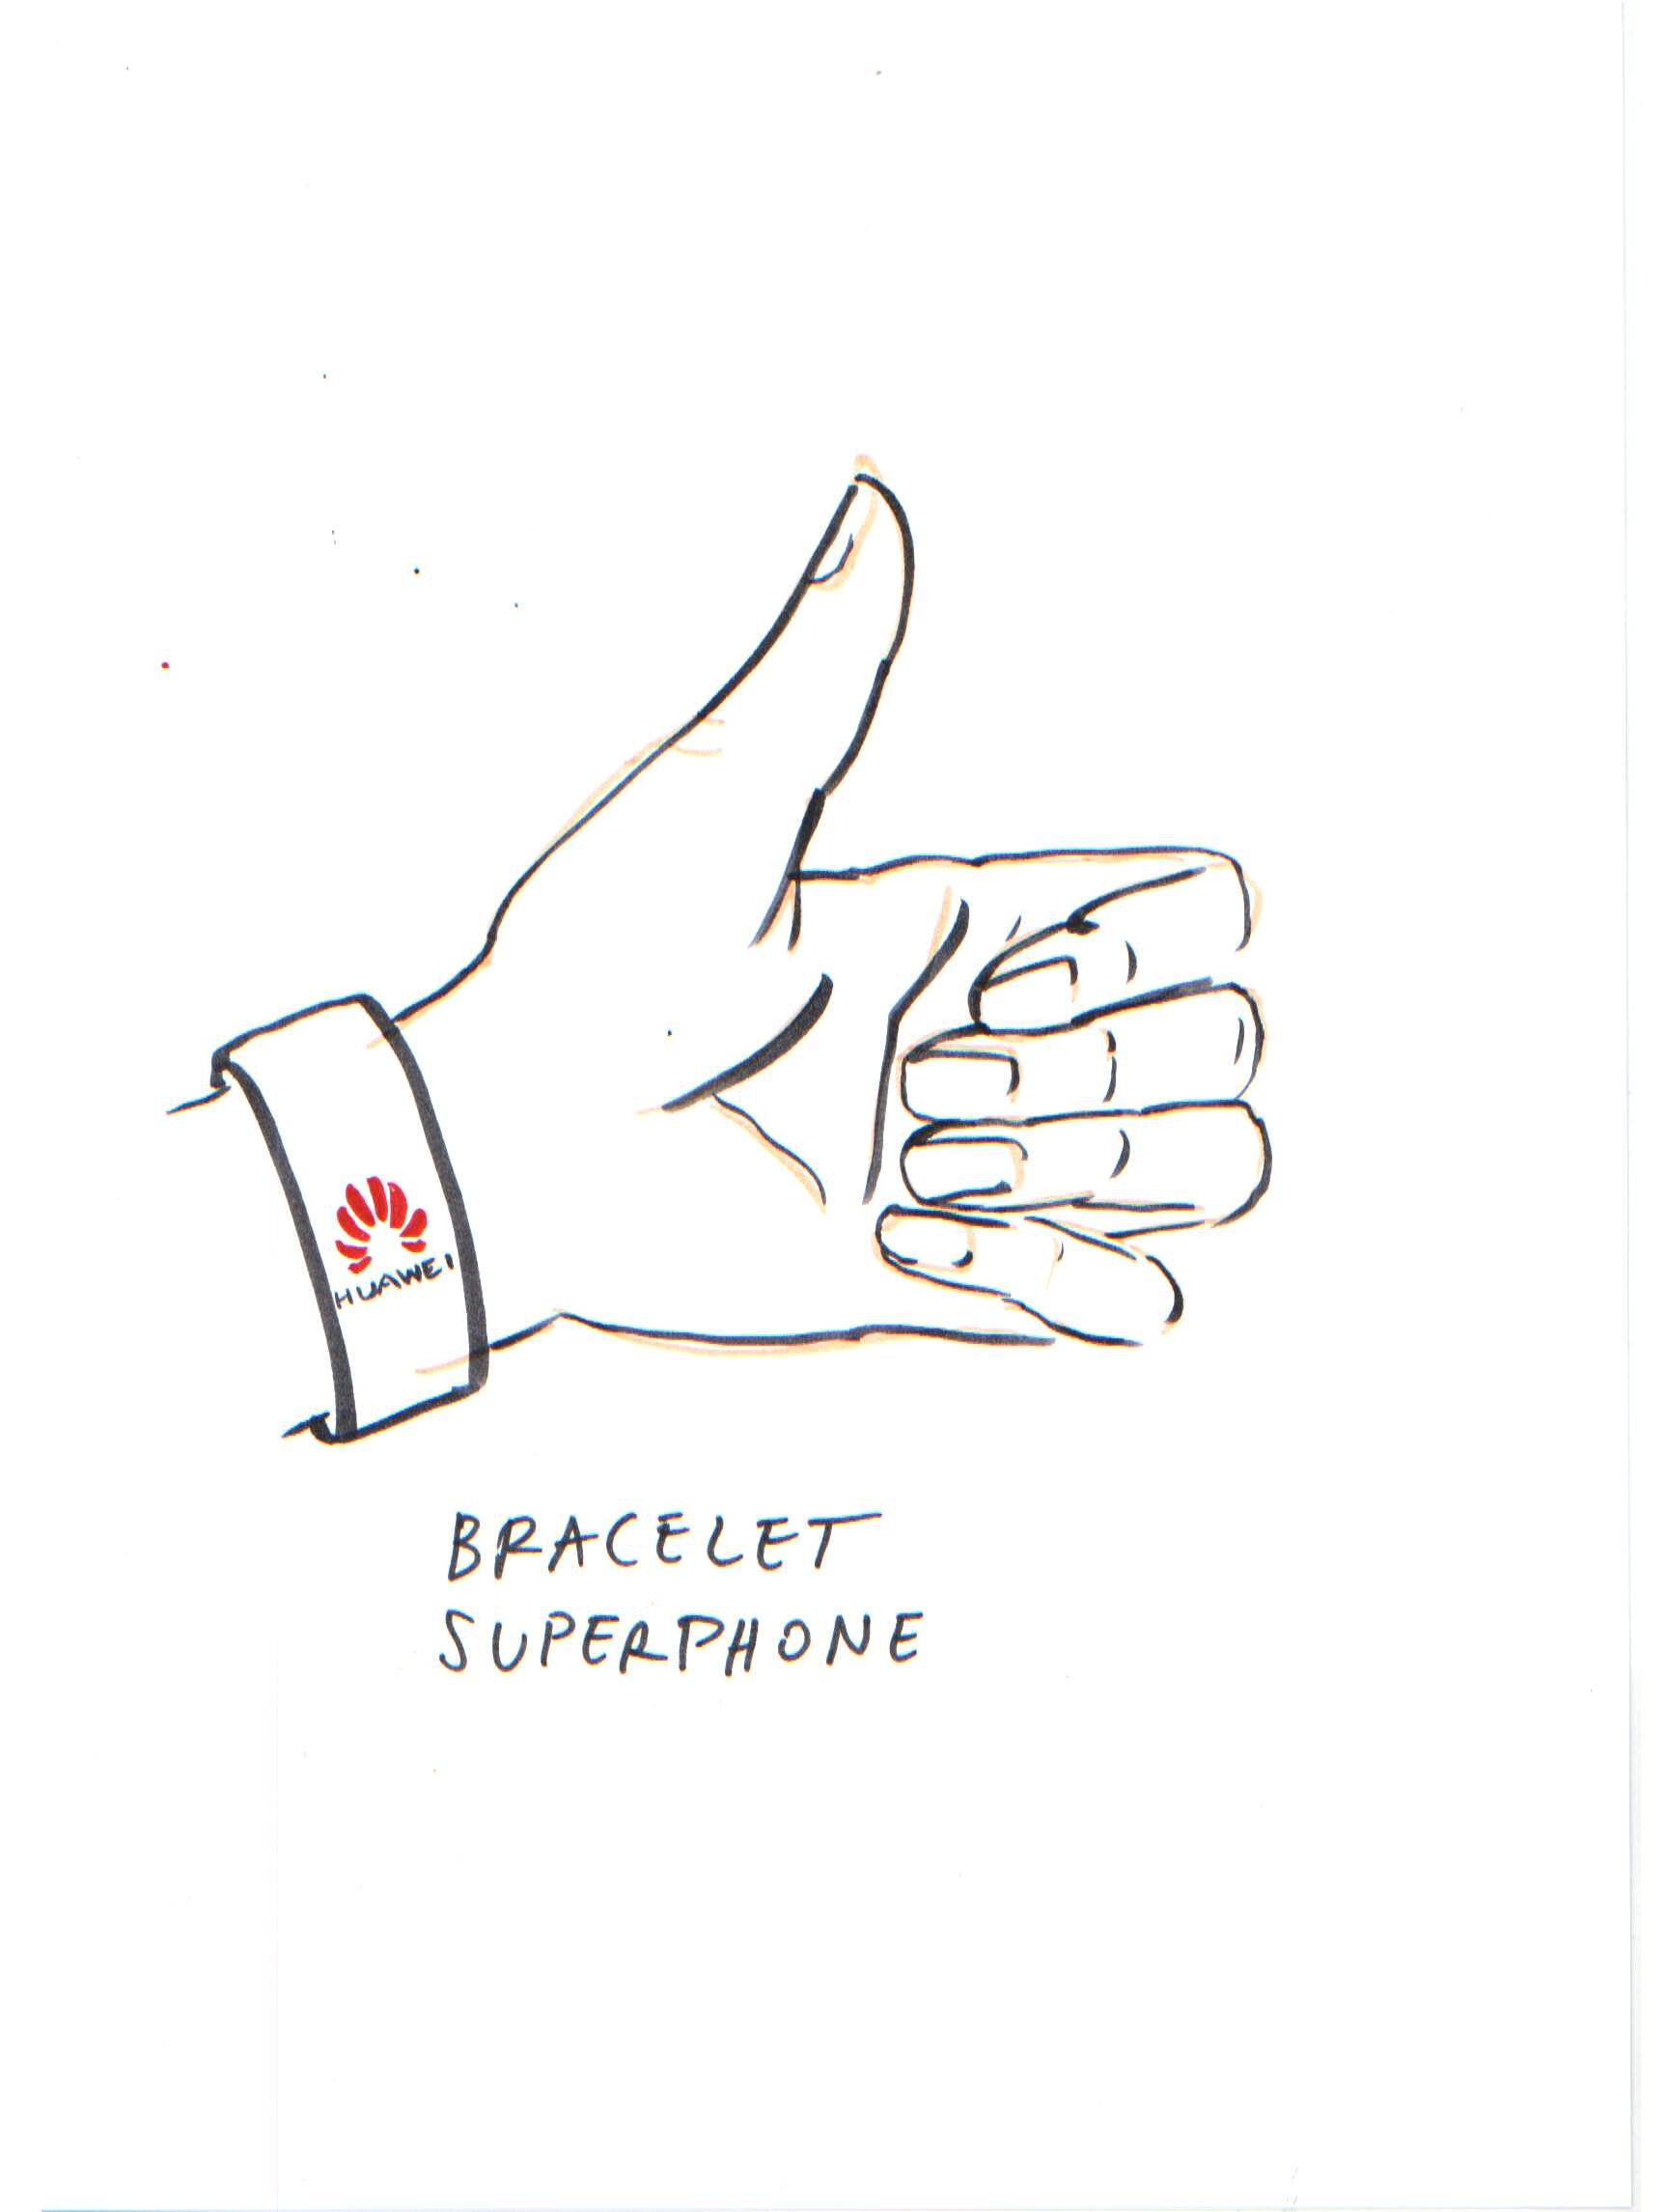 superphone_1_5.jpg